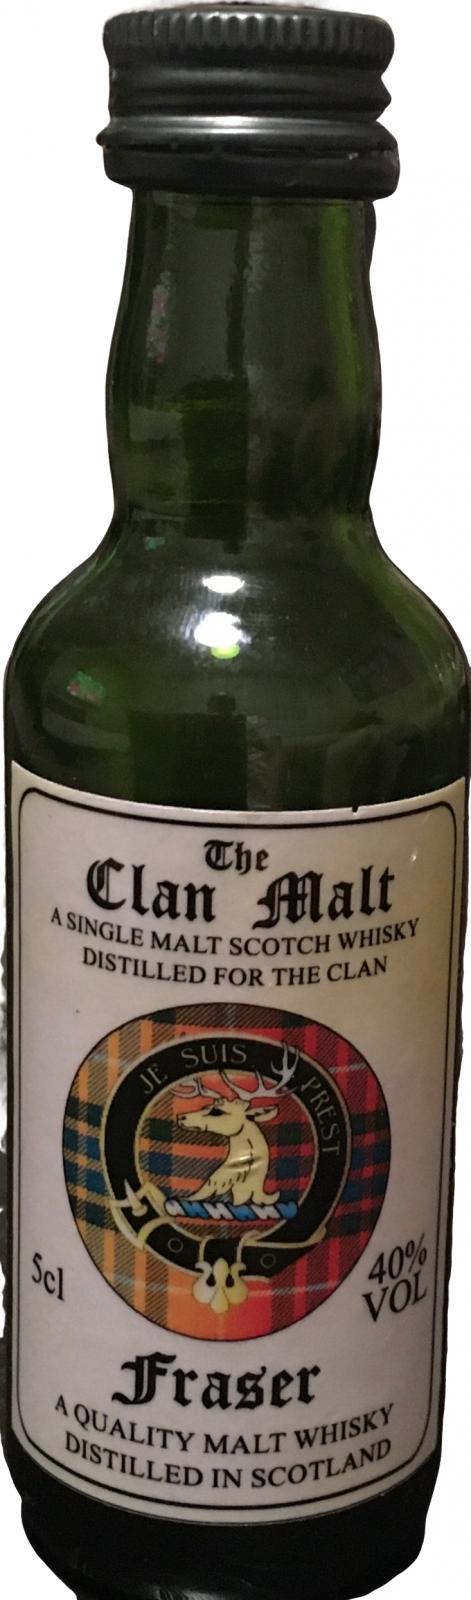 The Clan Malt Fraser ScCr